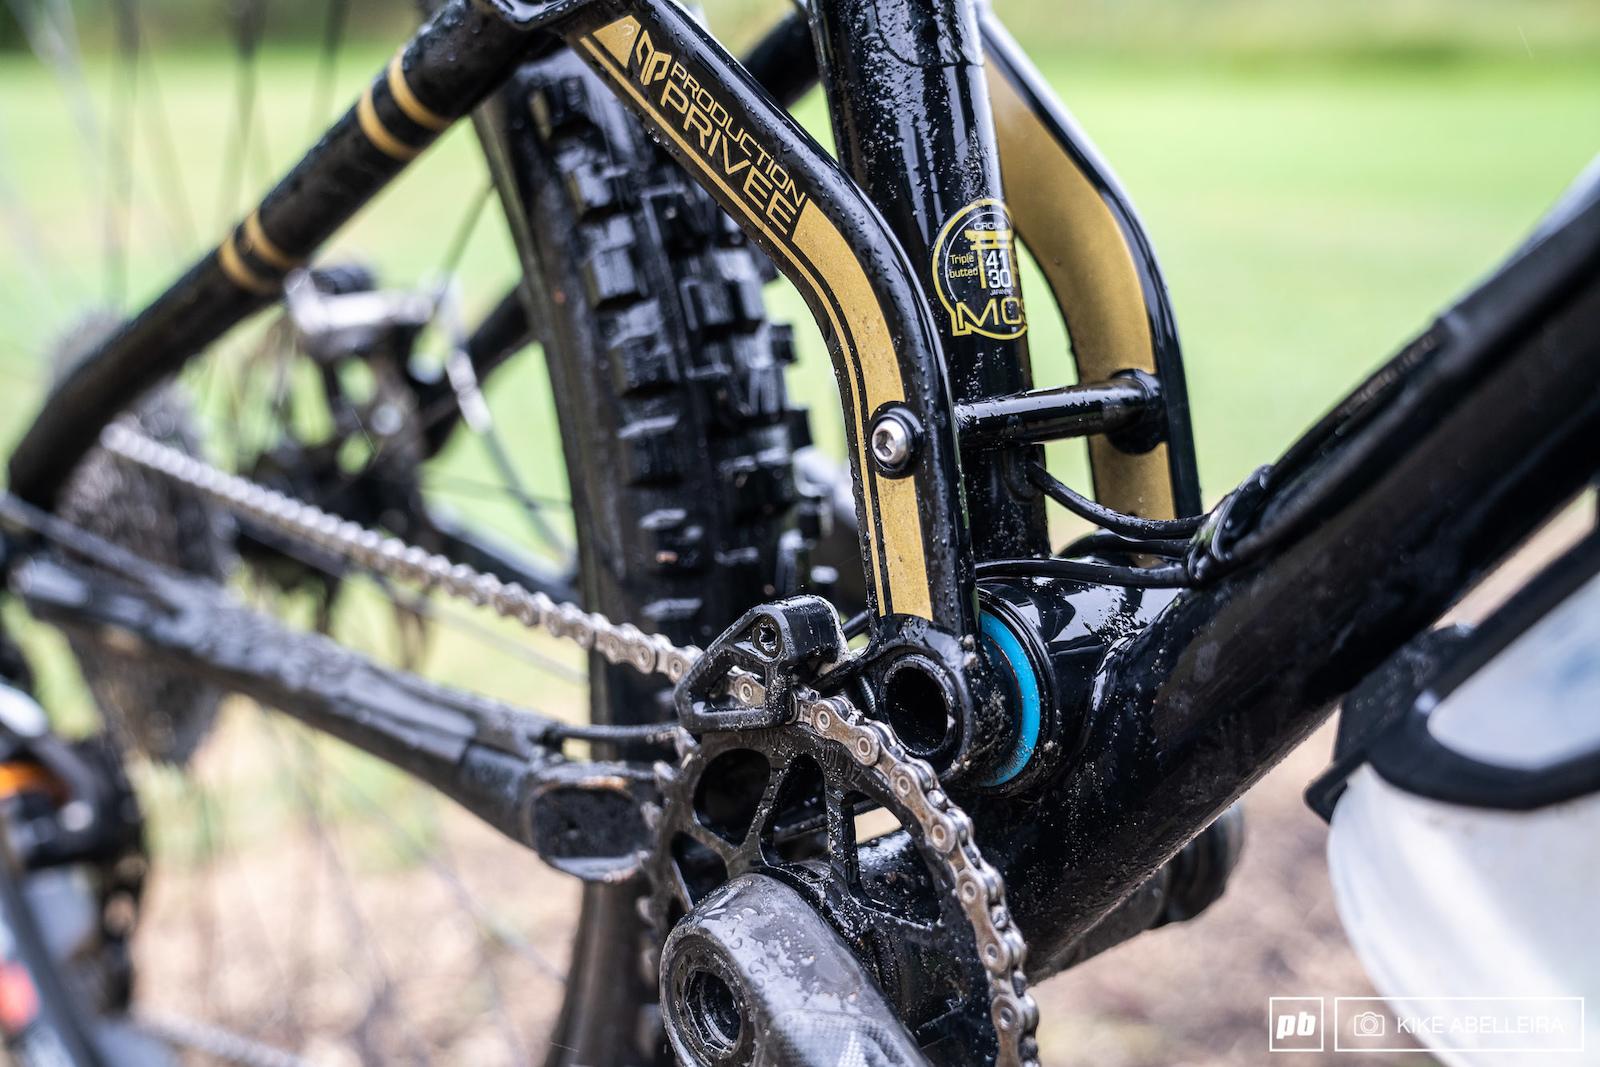 NZ Enduro 2019 bike checks